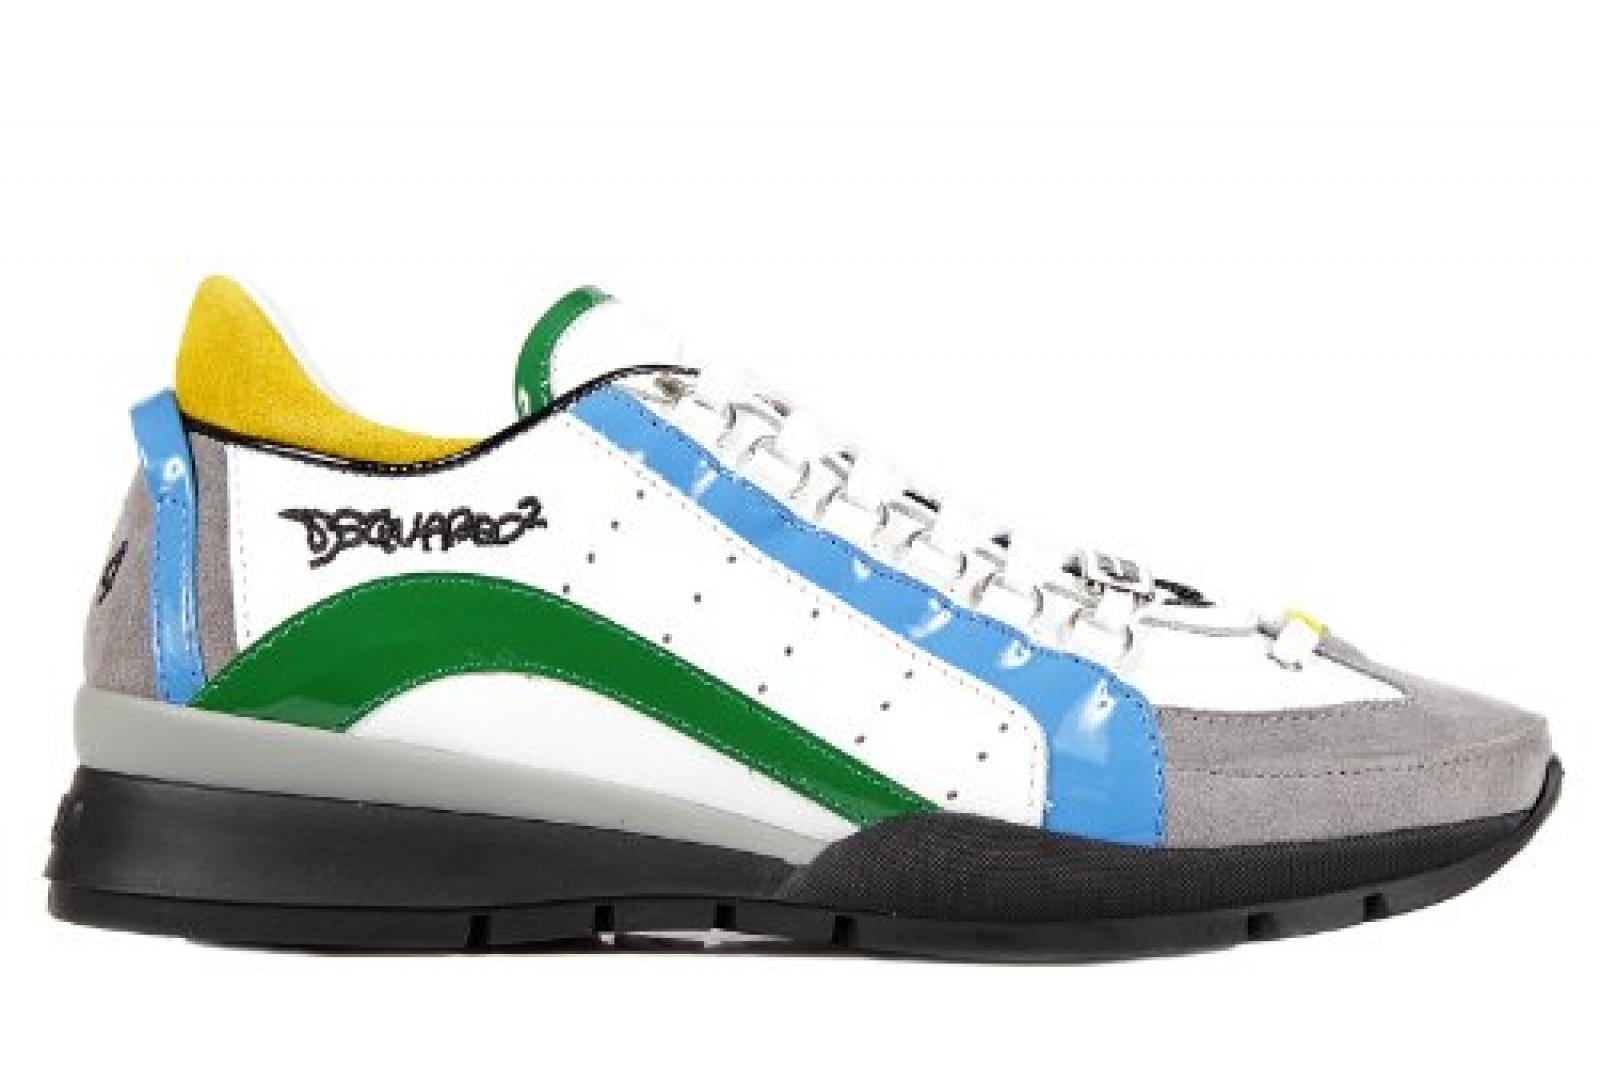 Dsquared2 Herrenschuhe Herren Leder Schuhe Sneakers Grün